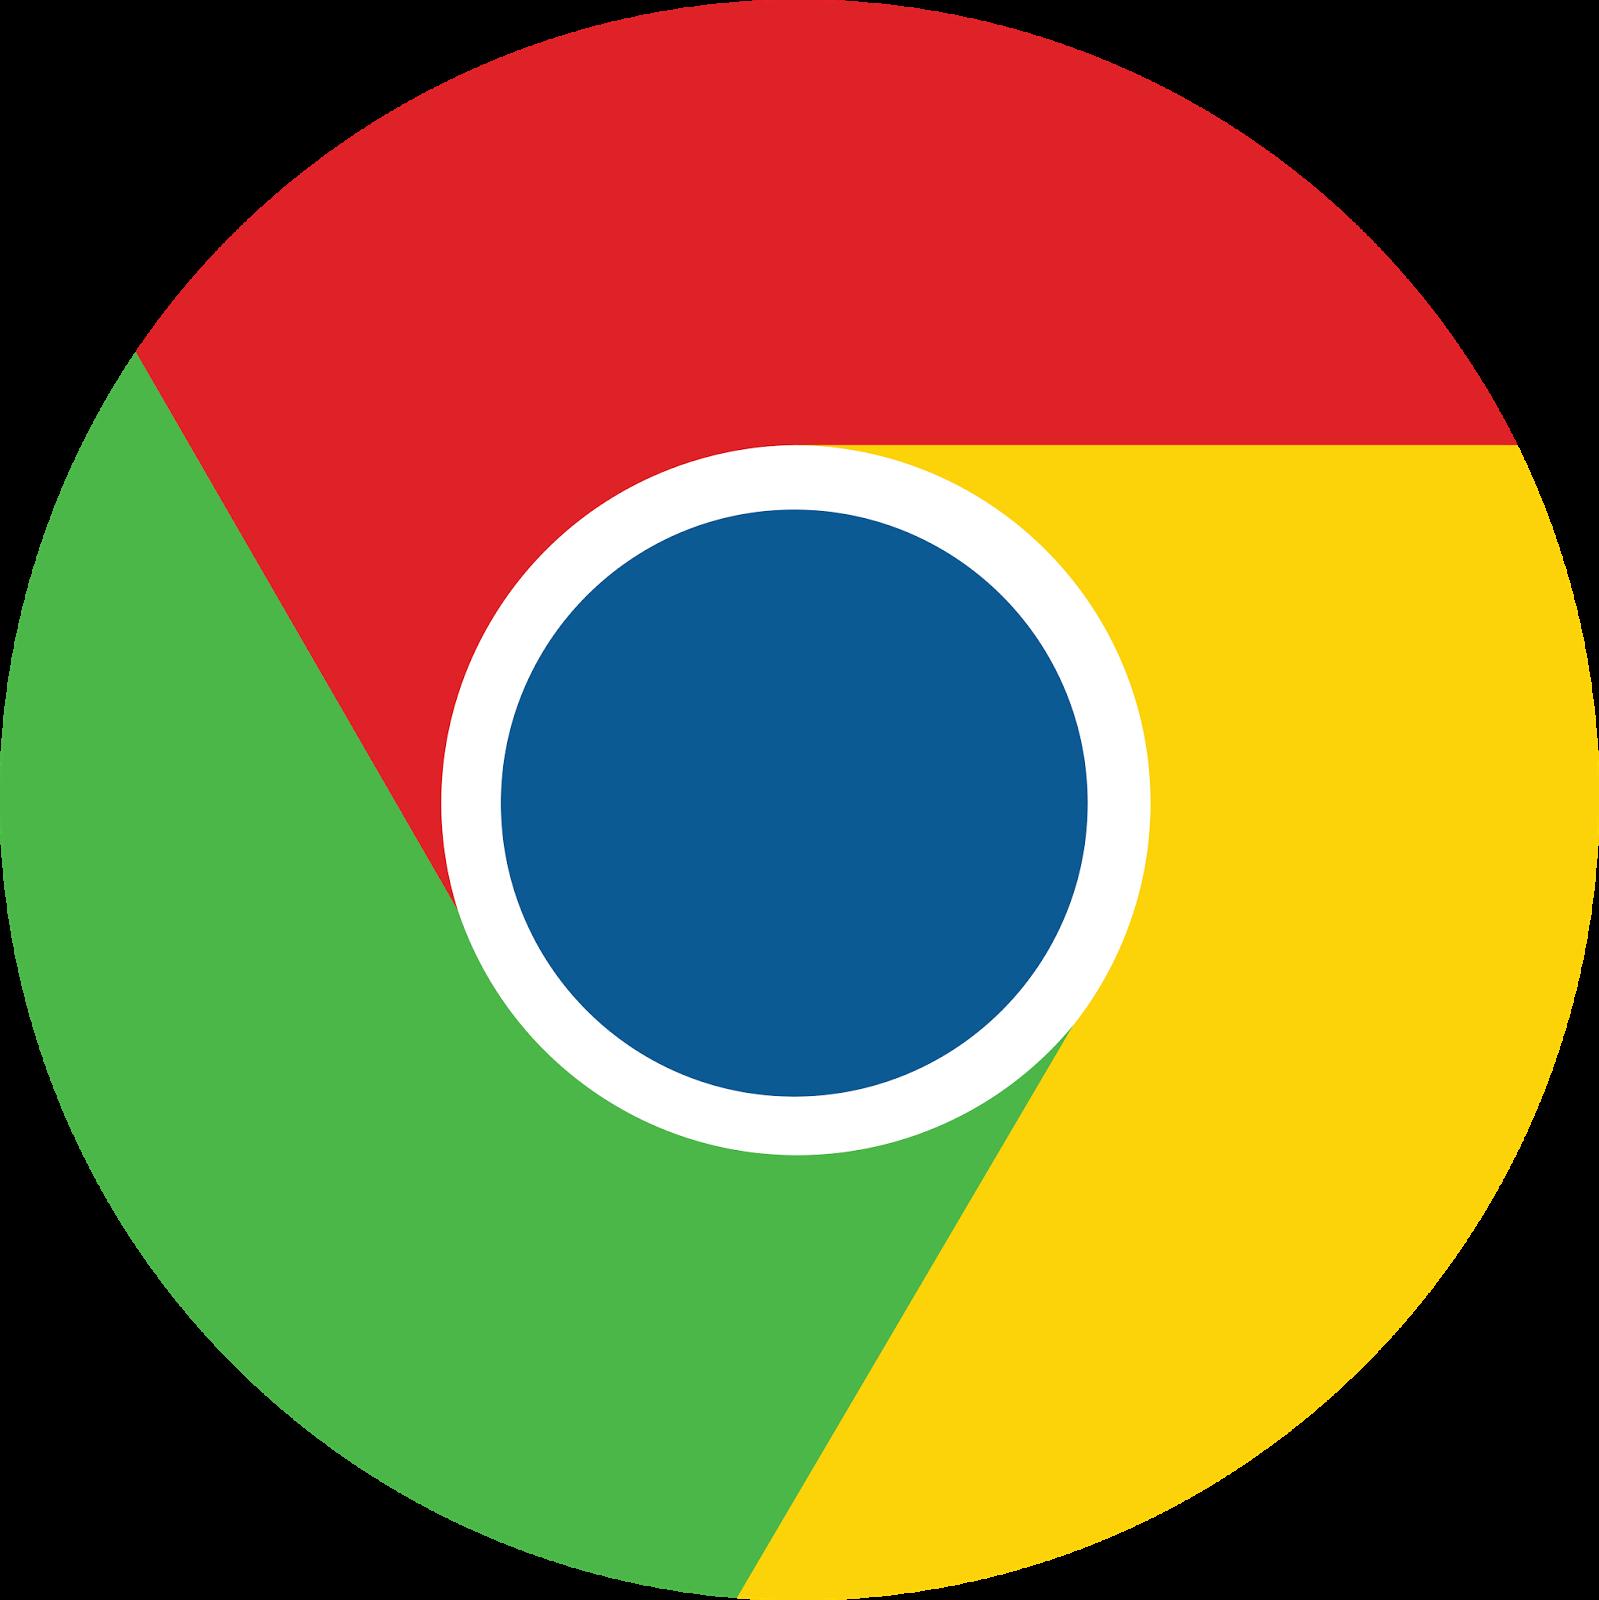 Google Flat Logo Png Images.